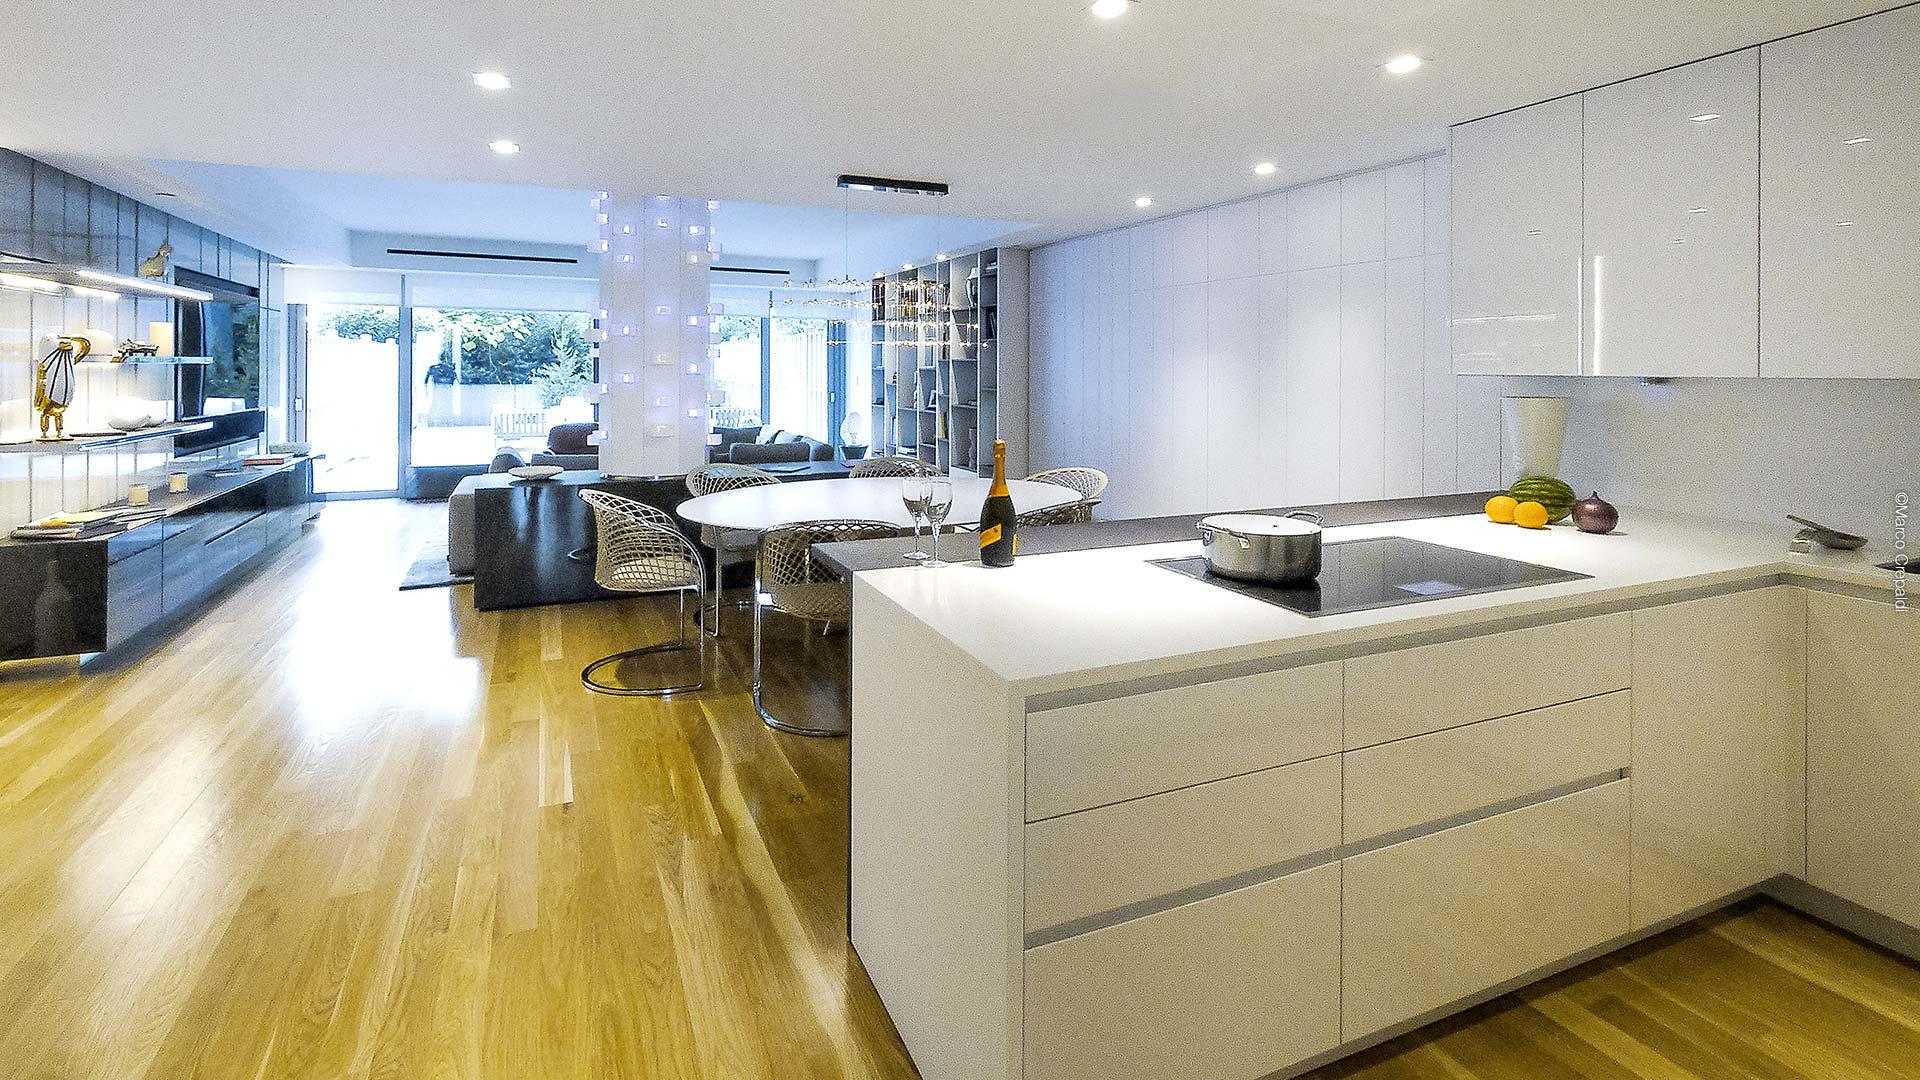 corian and wood corner kitchen